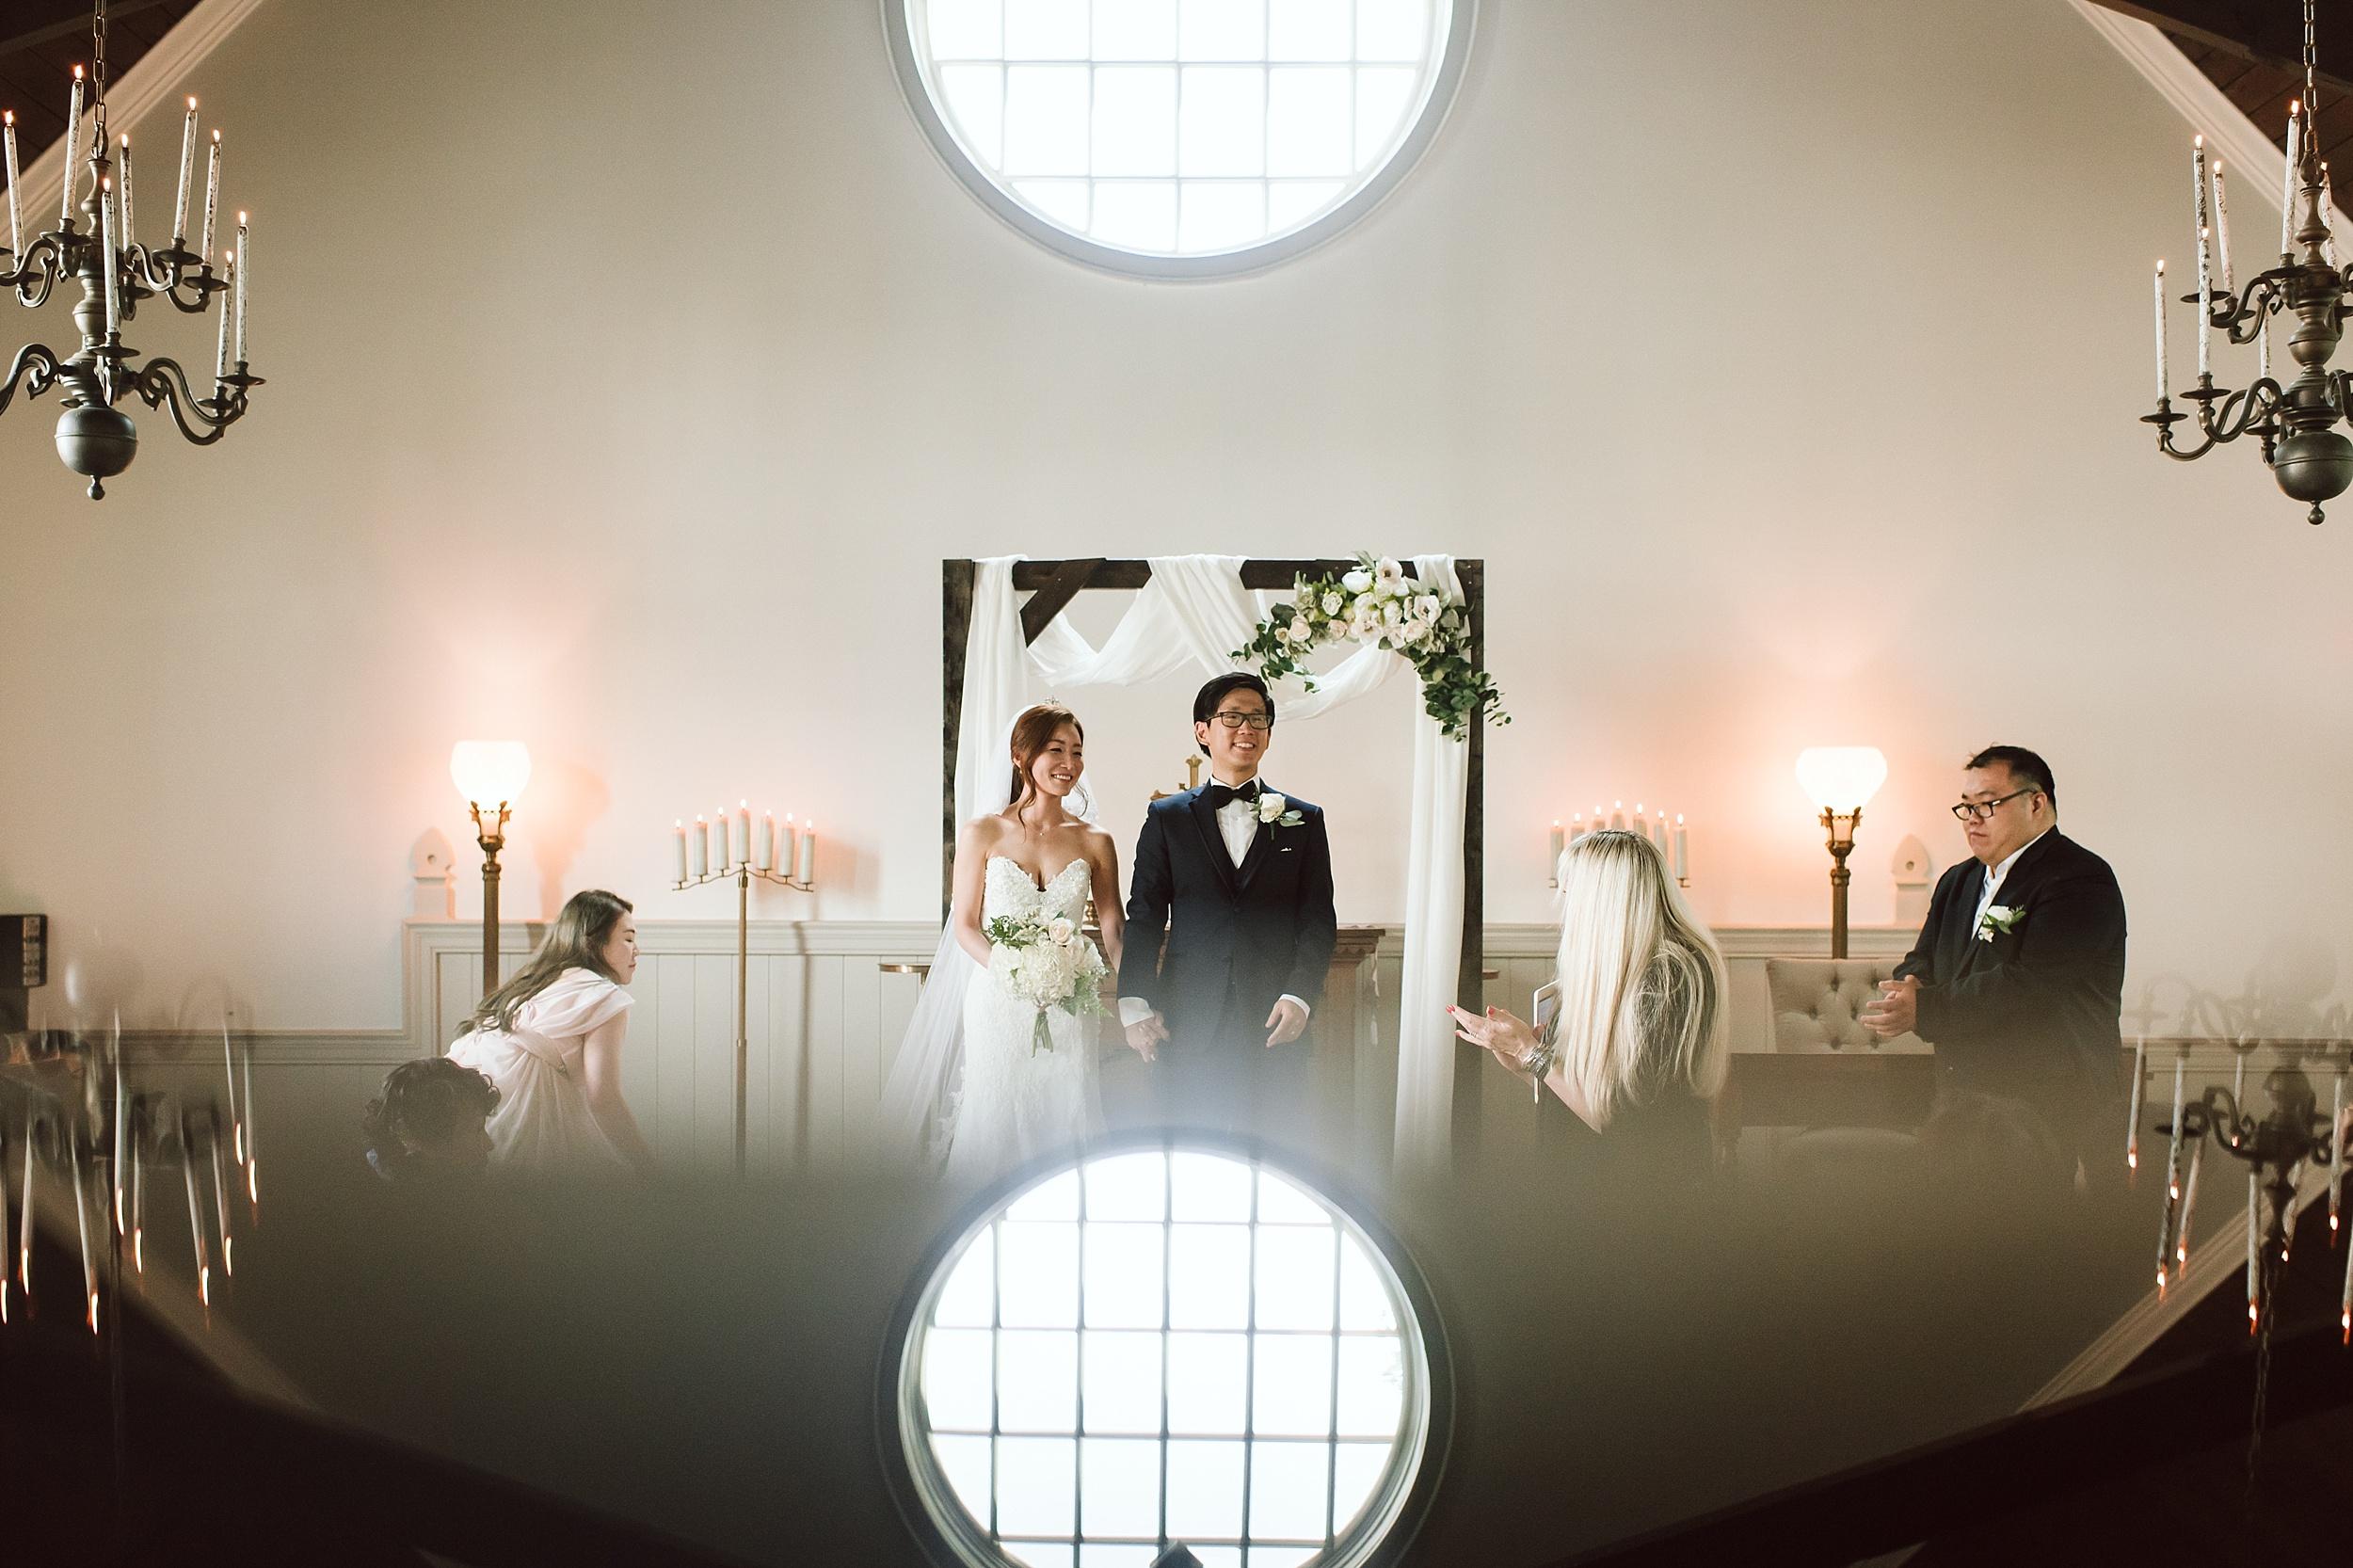 Doctors_House_Kleinburg_Wedding_Toronto_Photographer_0026.jpg